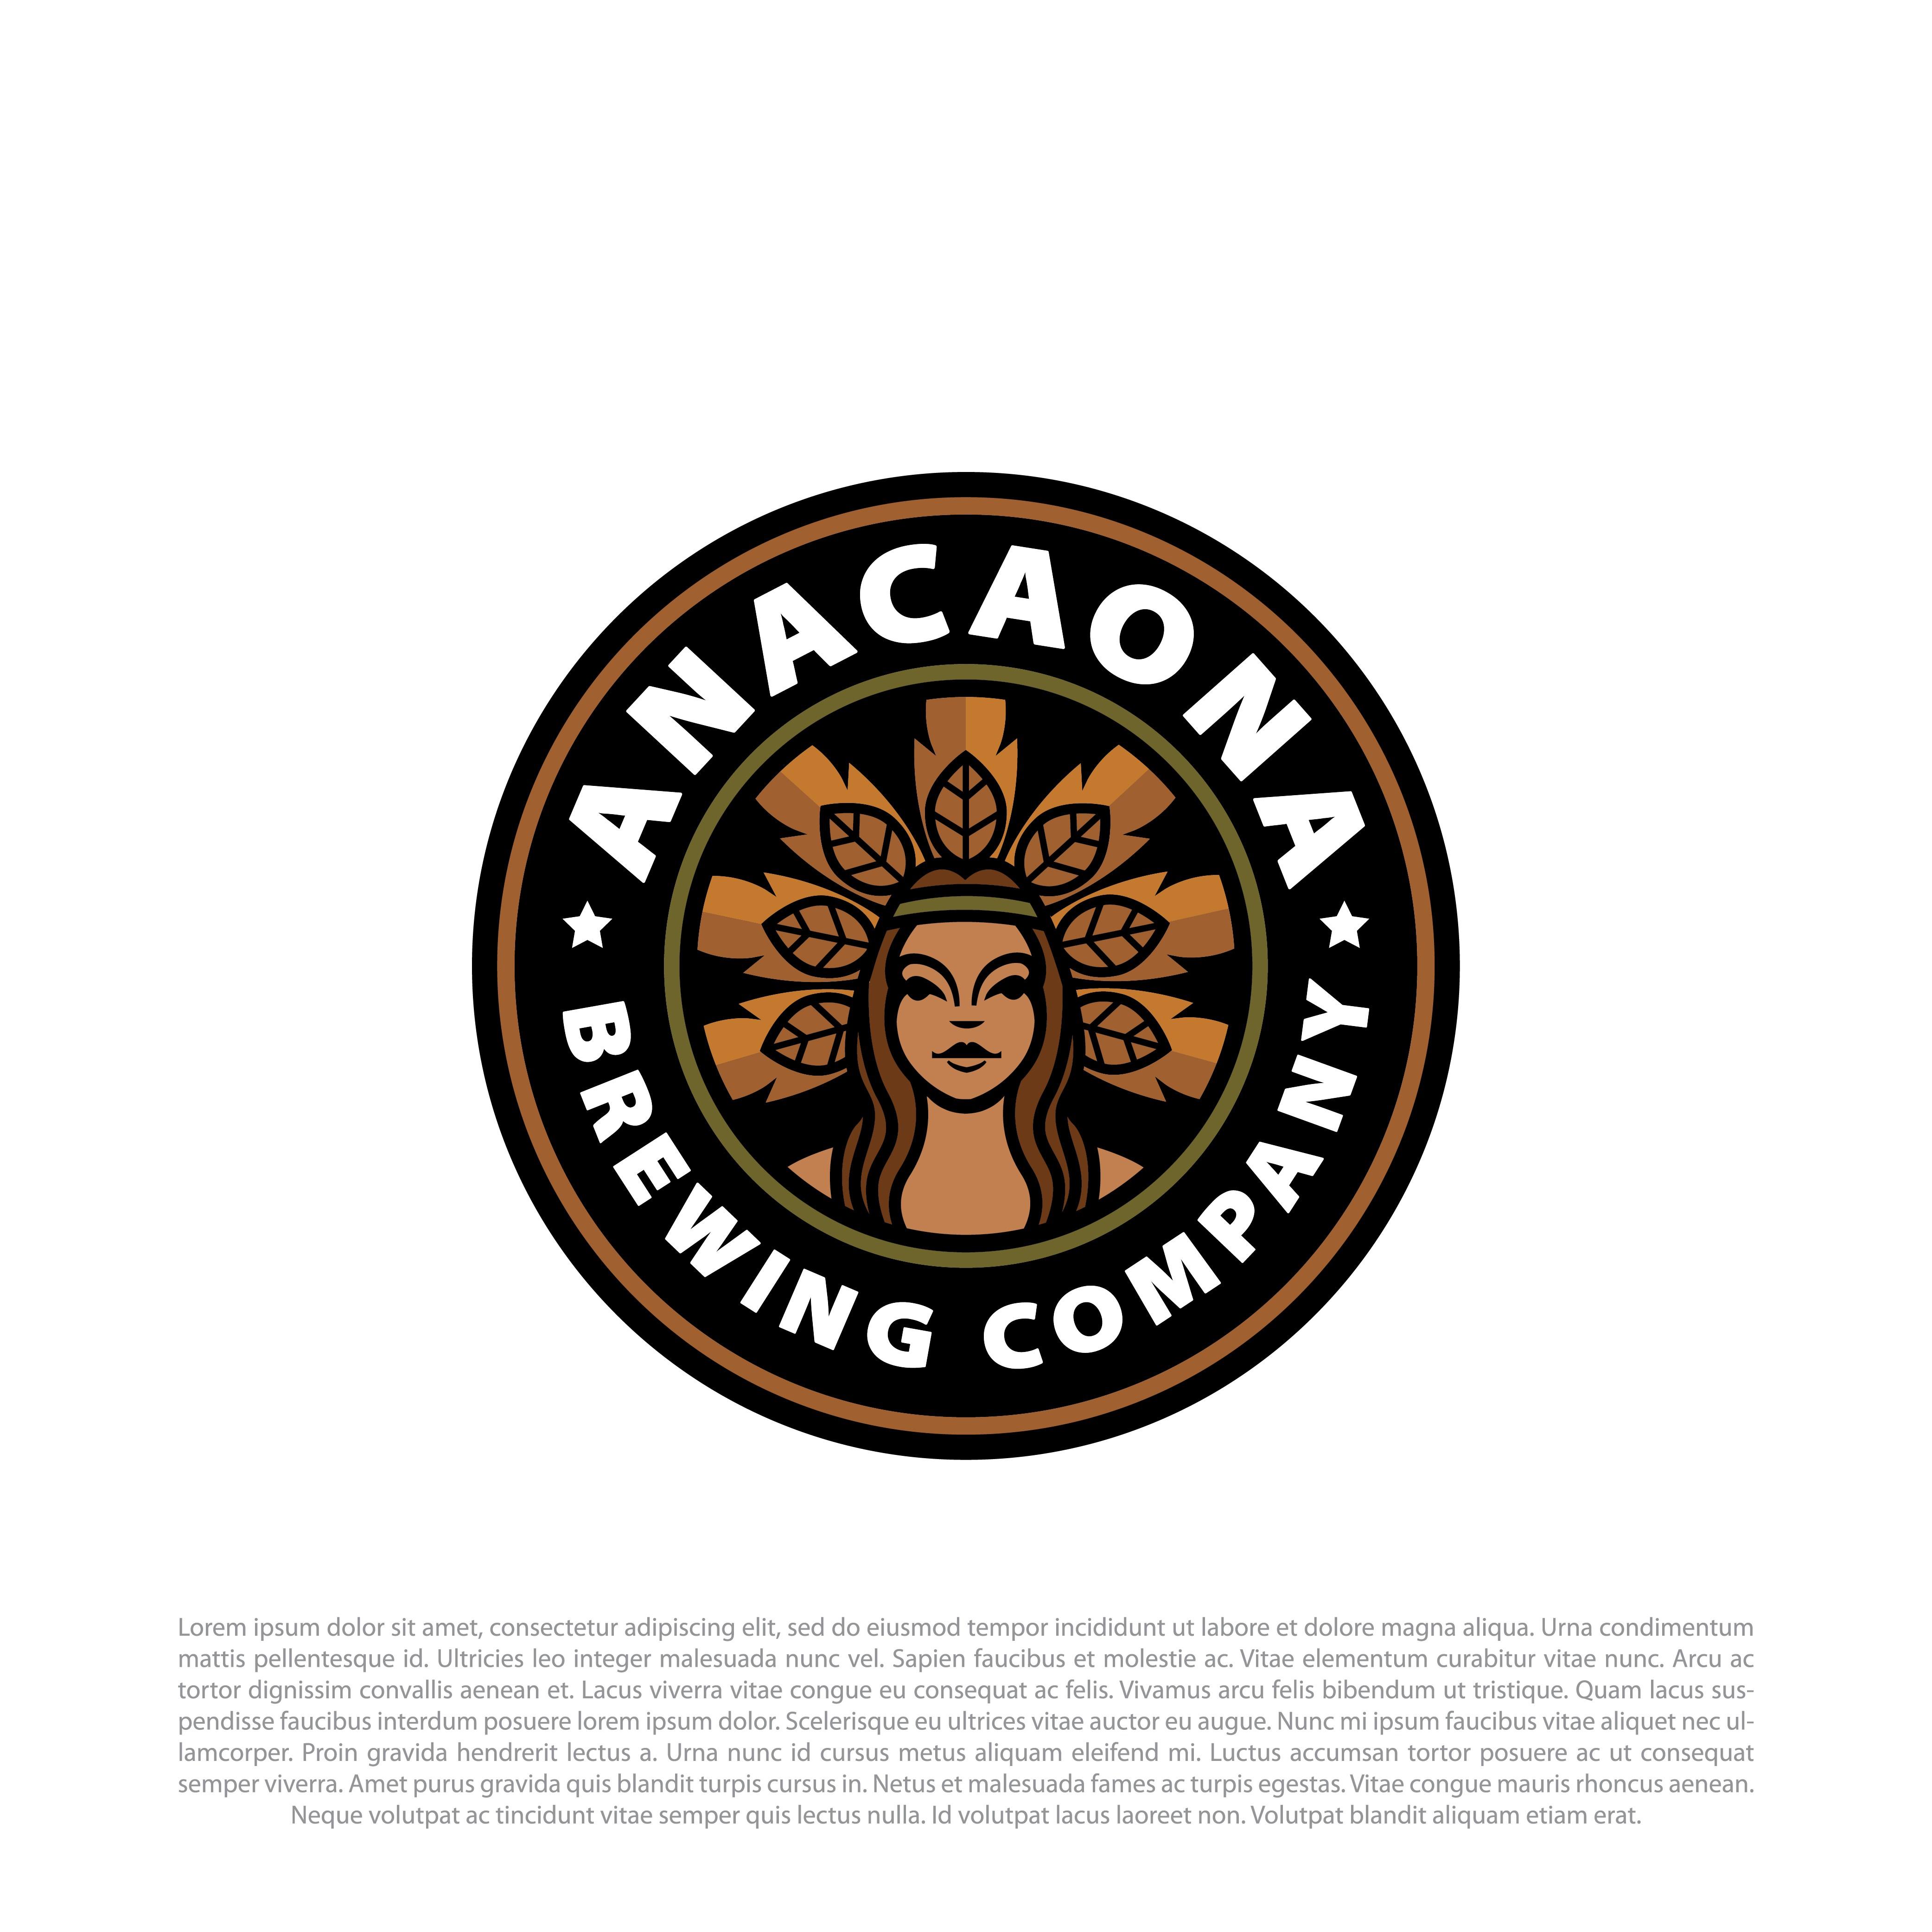 Craft brewery company logo contest